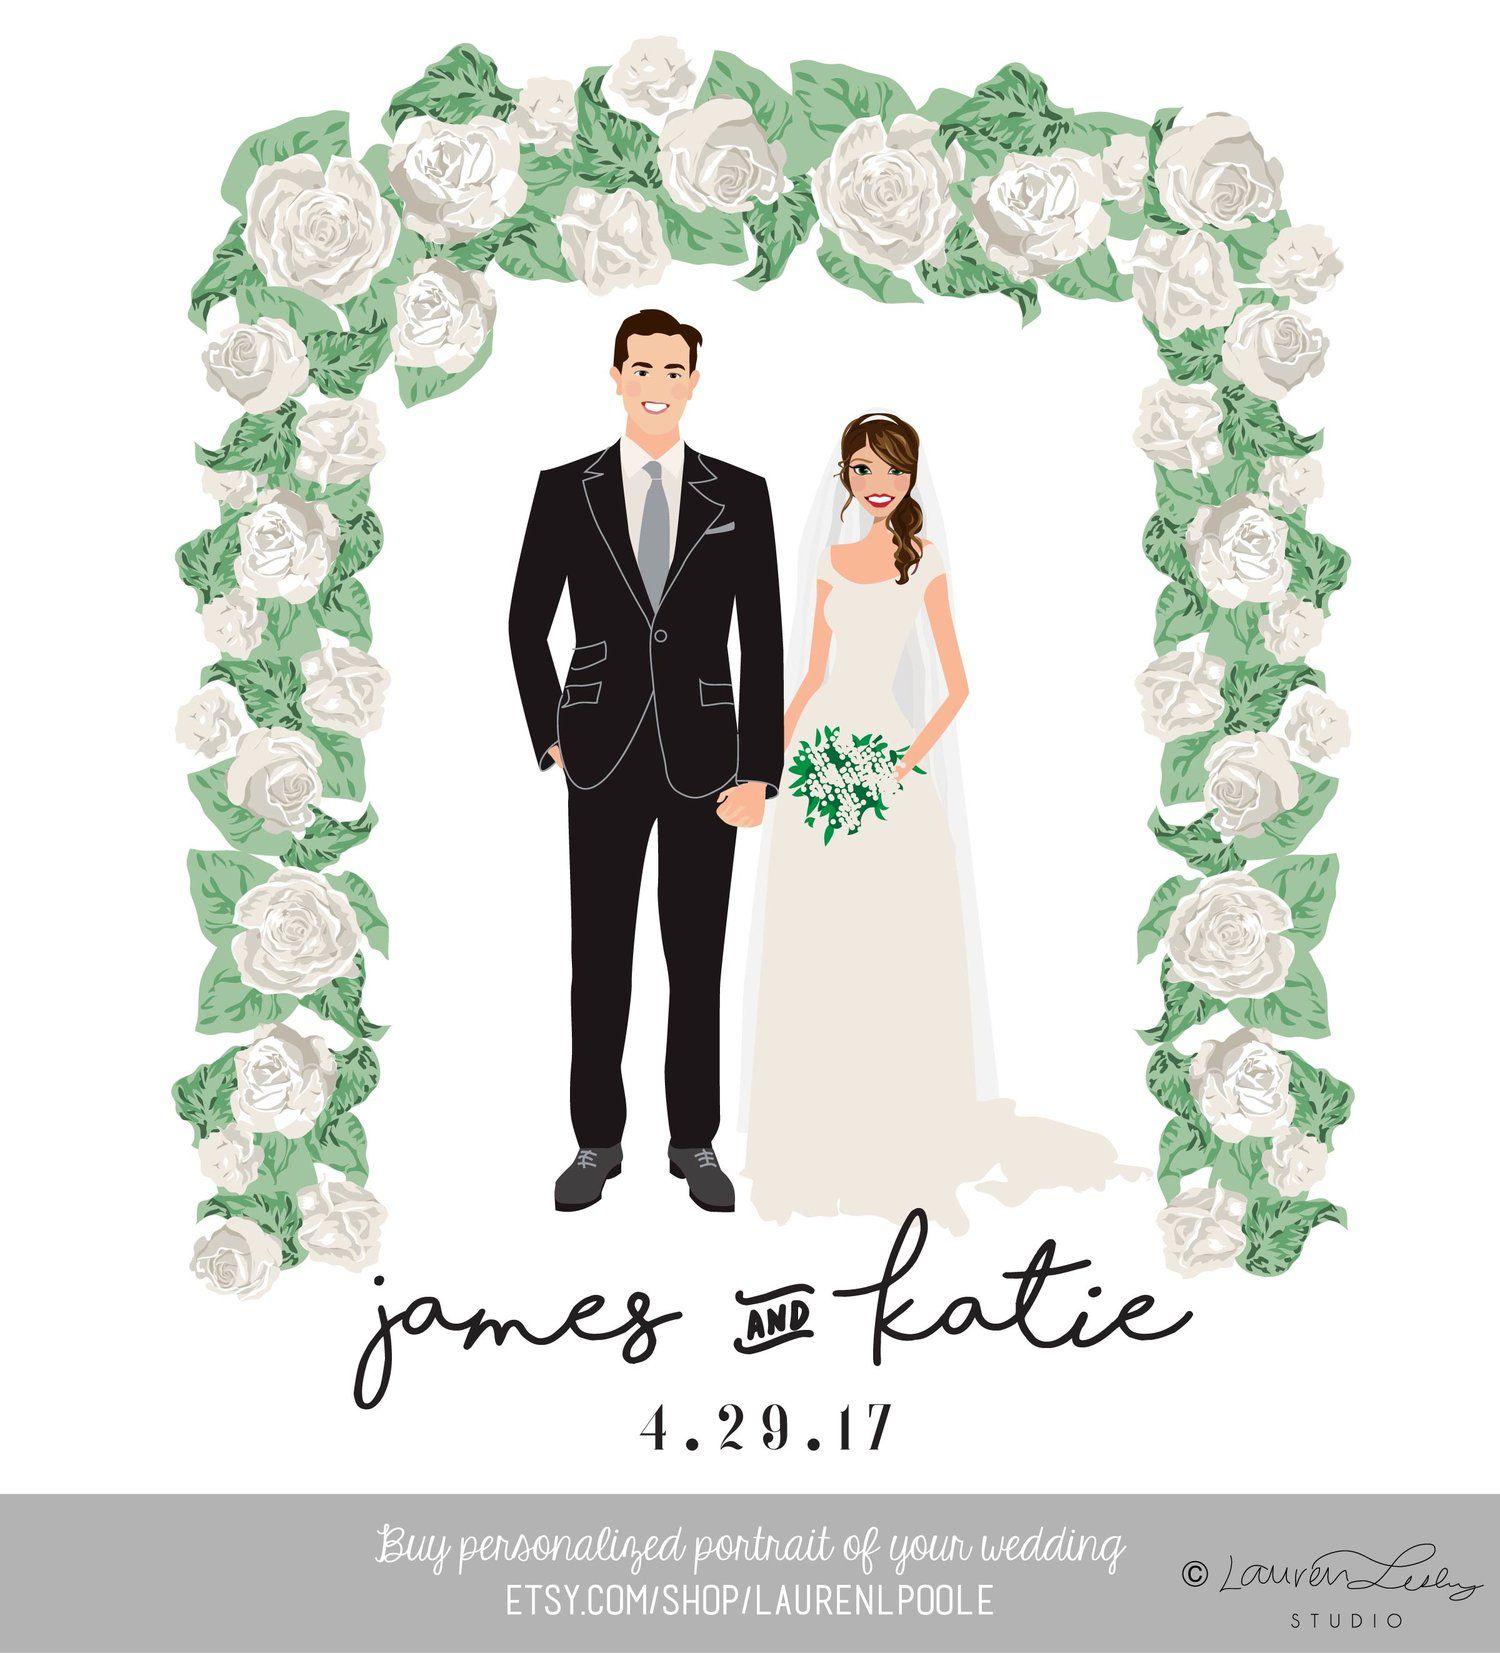 Design Your Own Wedding Illustration Portrait.